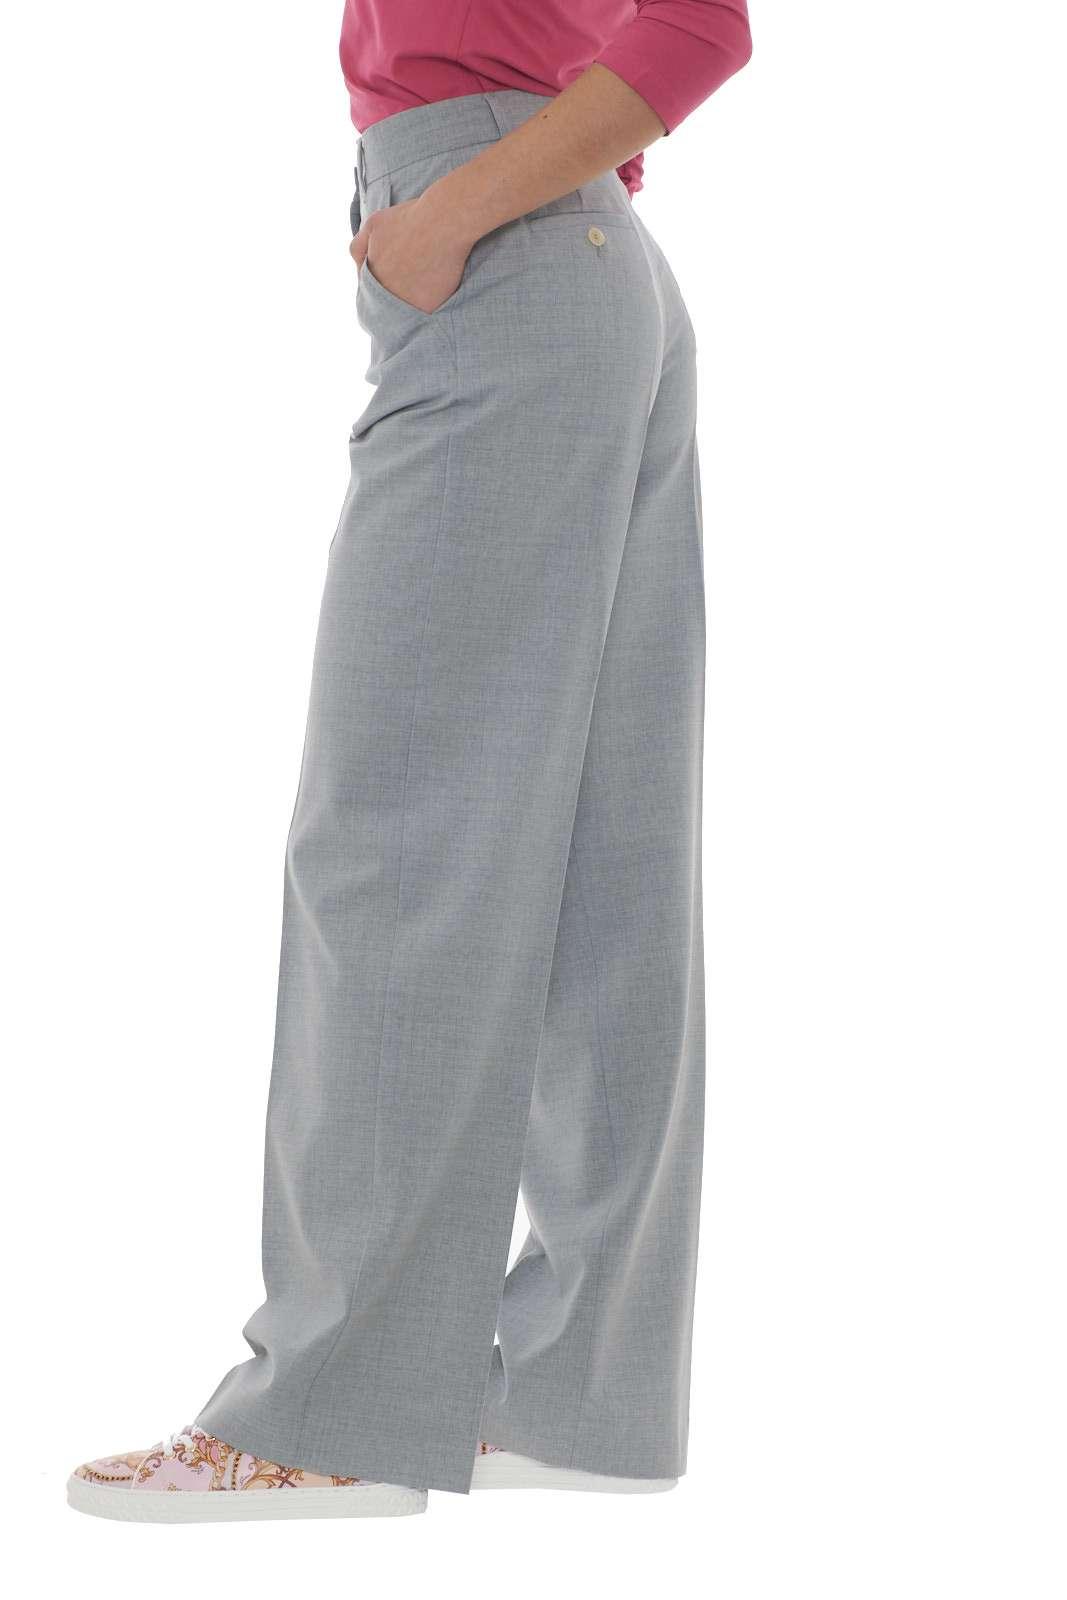 https://www.parmax.com/media/catalog/product/a/i/PE-outlet_parmax-pantaloni-donna-MaxMara-51311407-B.jpg